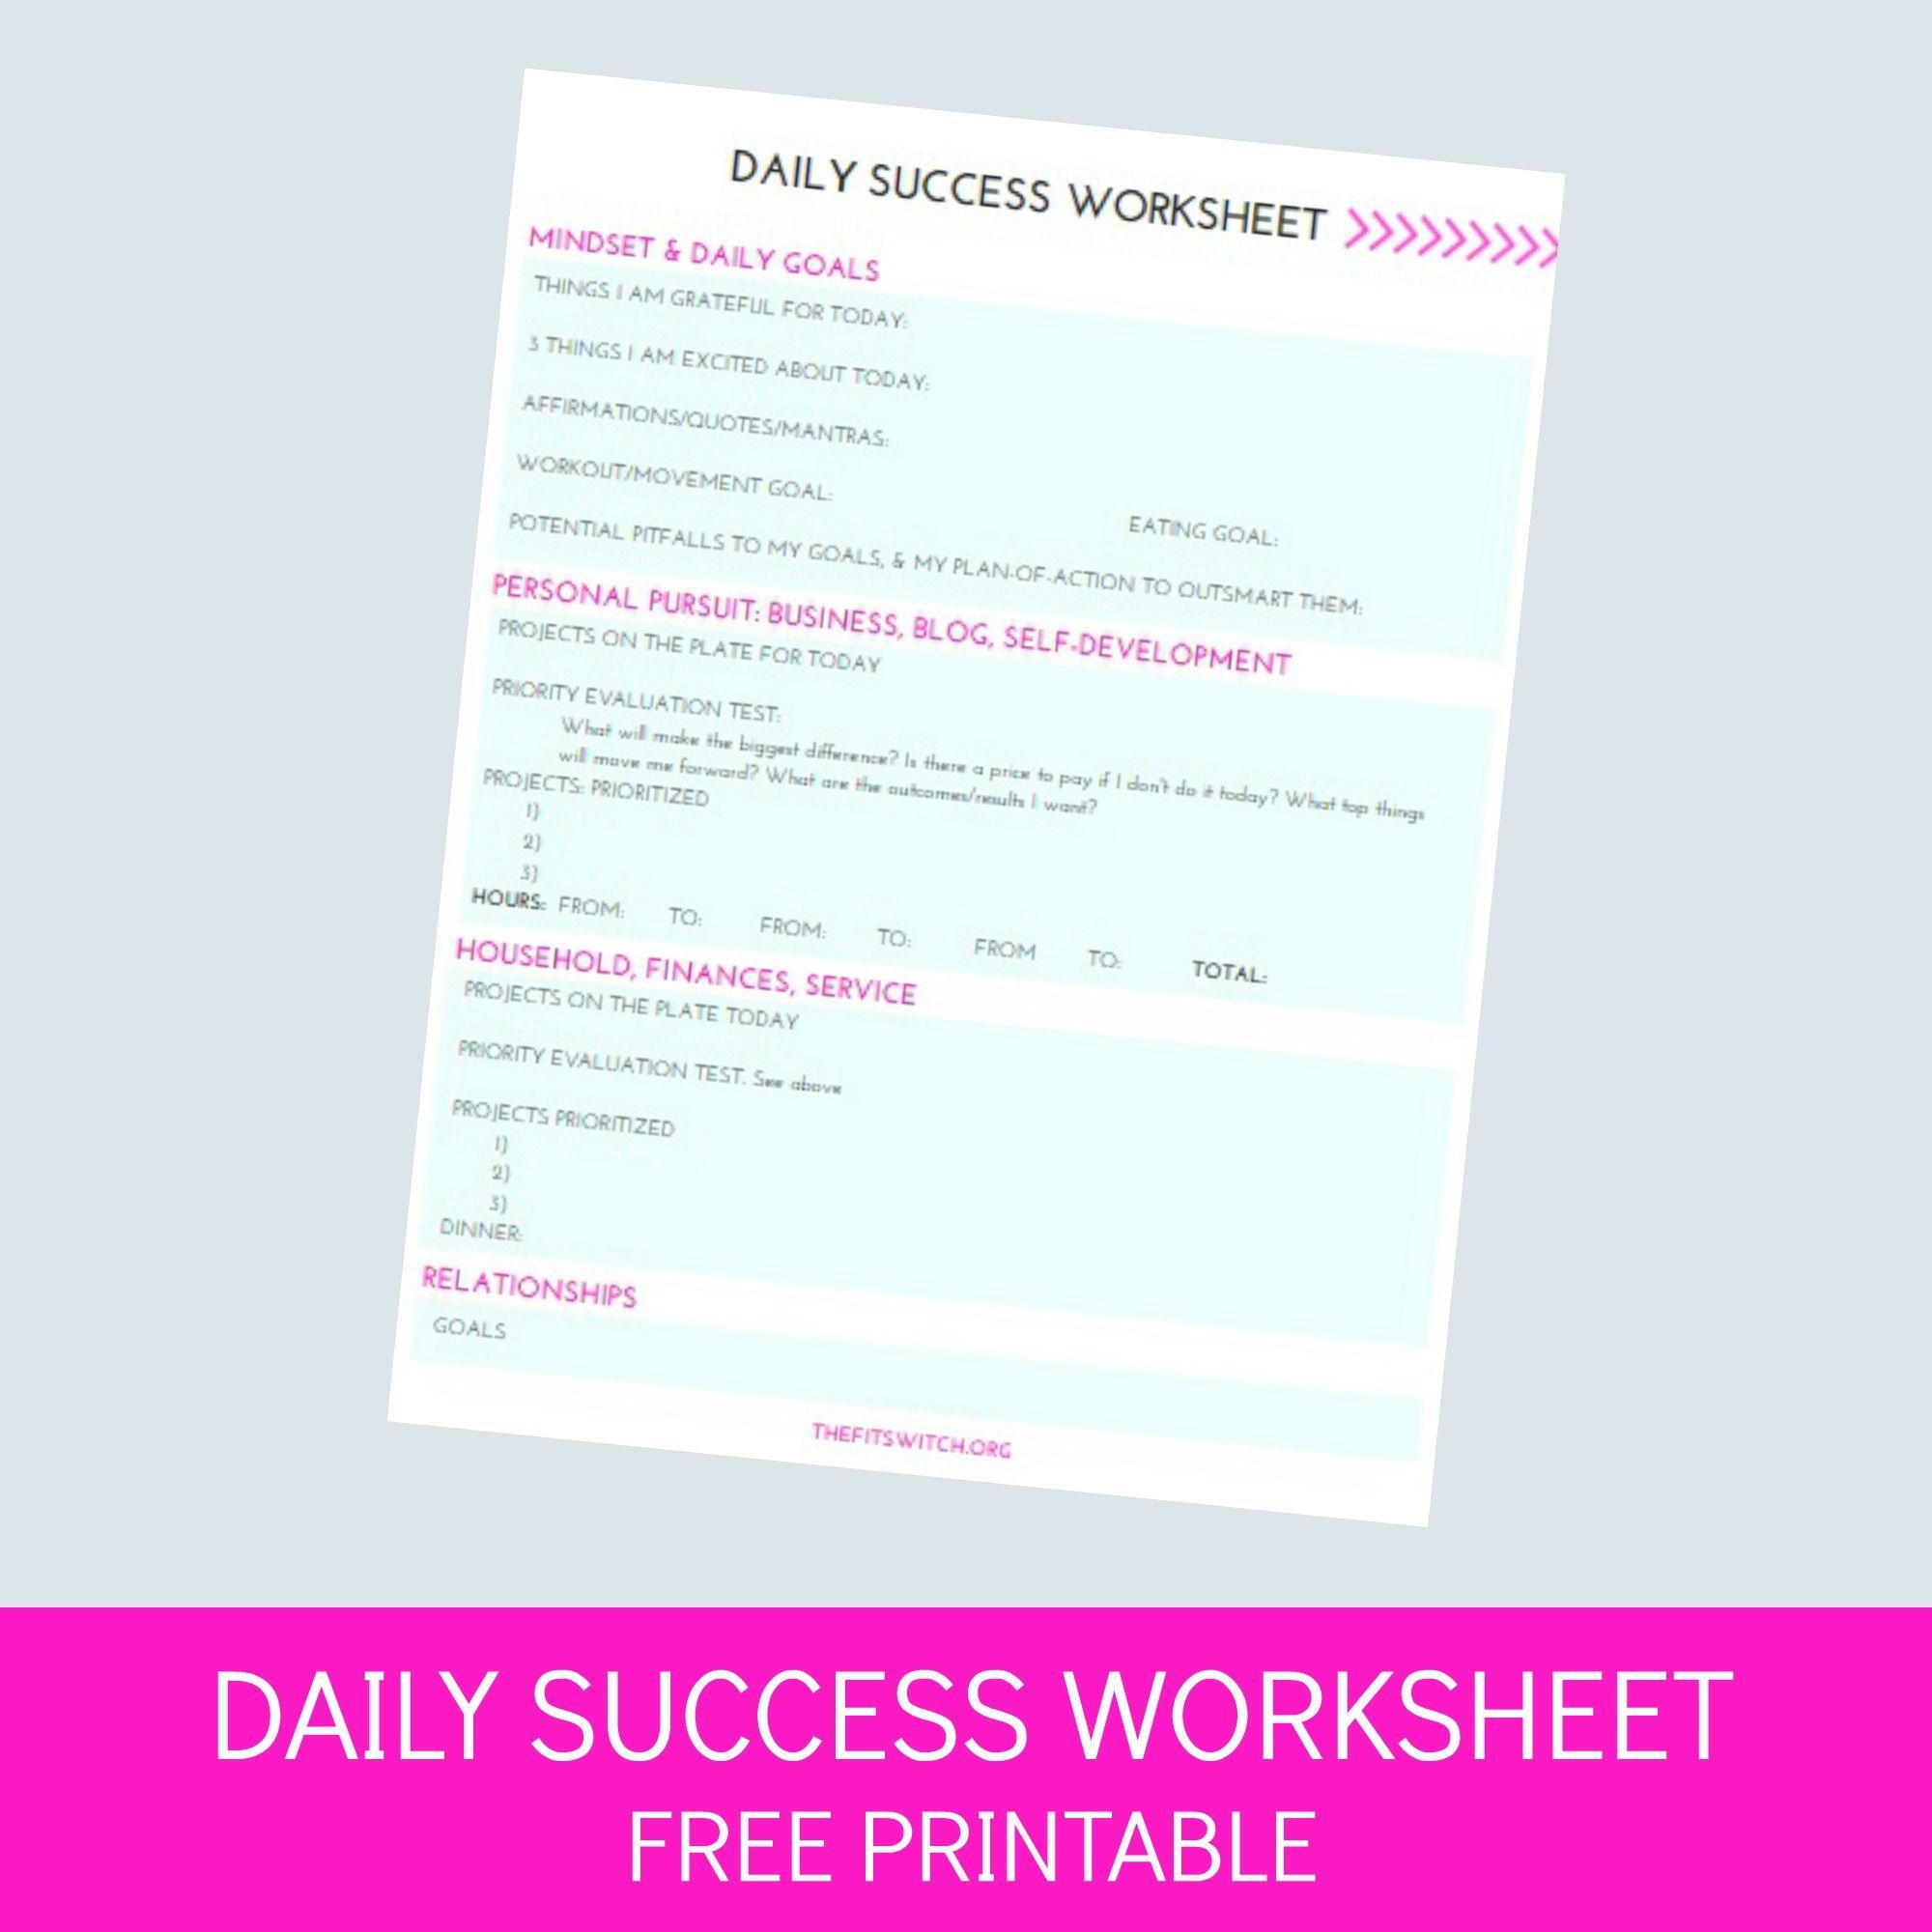 Daily Success Worksheet